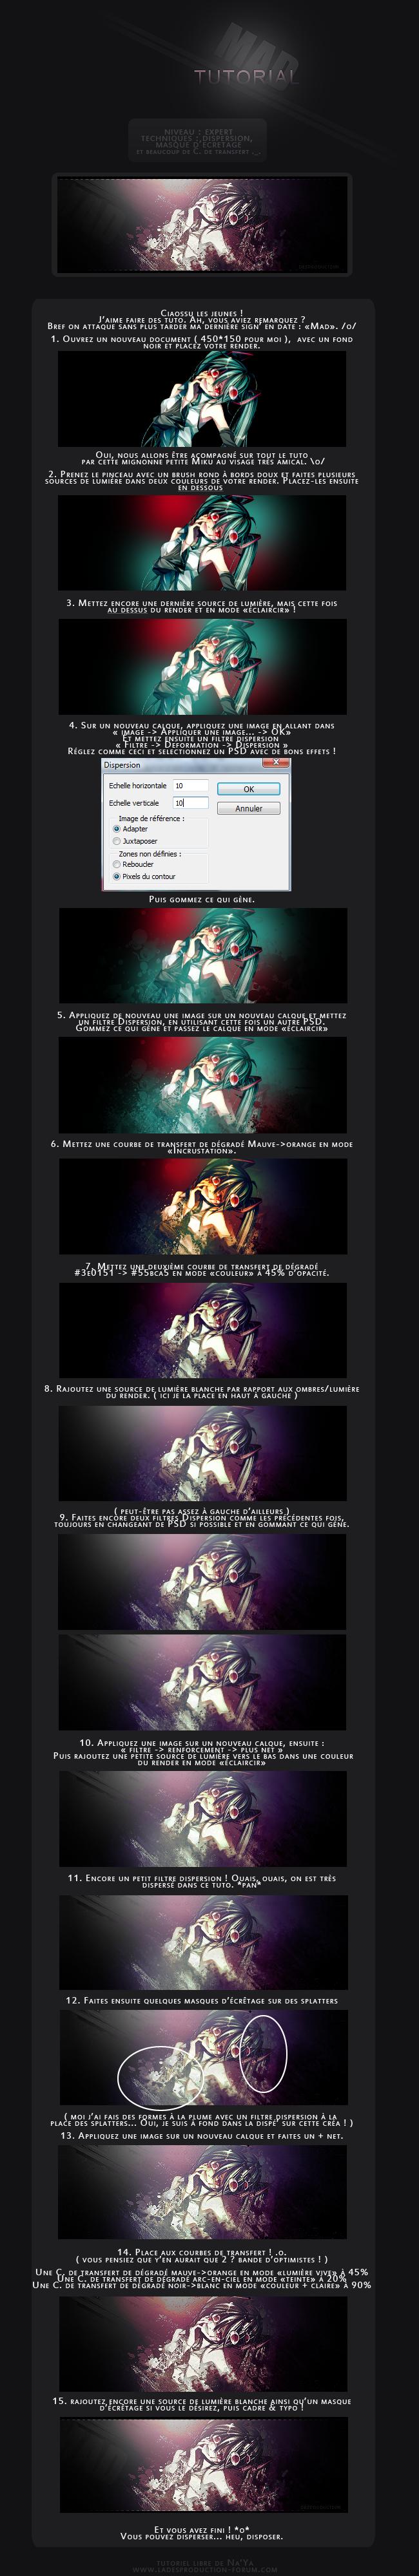 Tag filtre sur Never Utopia - graphisme, codage et game design 20040206232724833